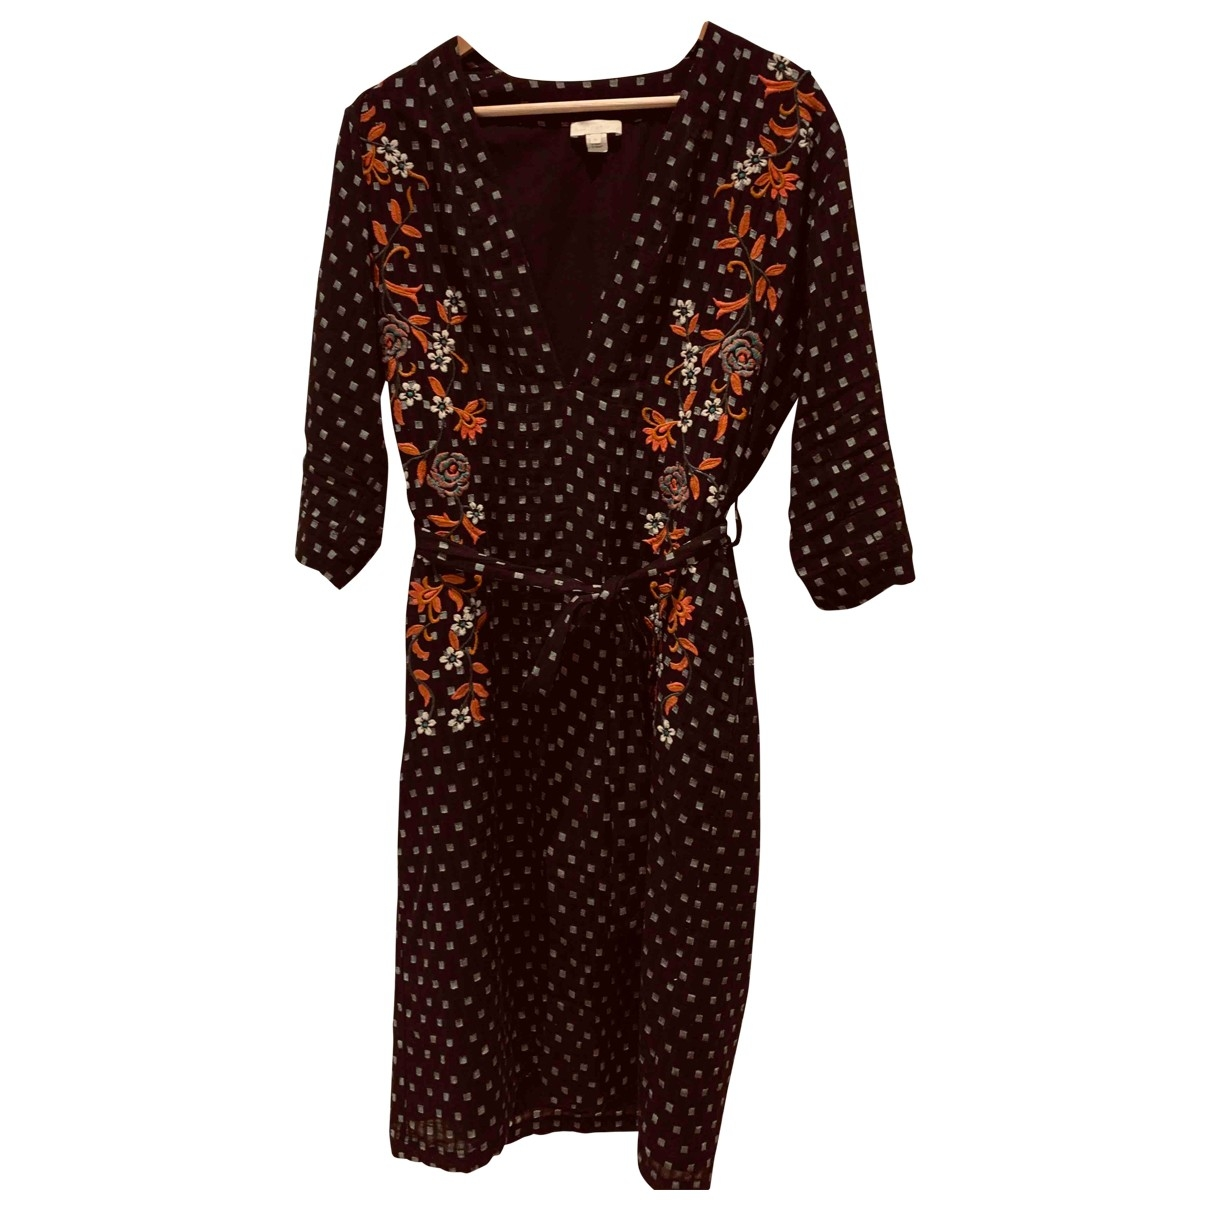 Hoss Intropia \N Kleid in  Schwarz Baumwolle